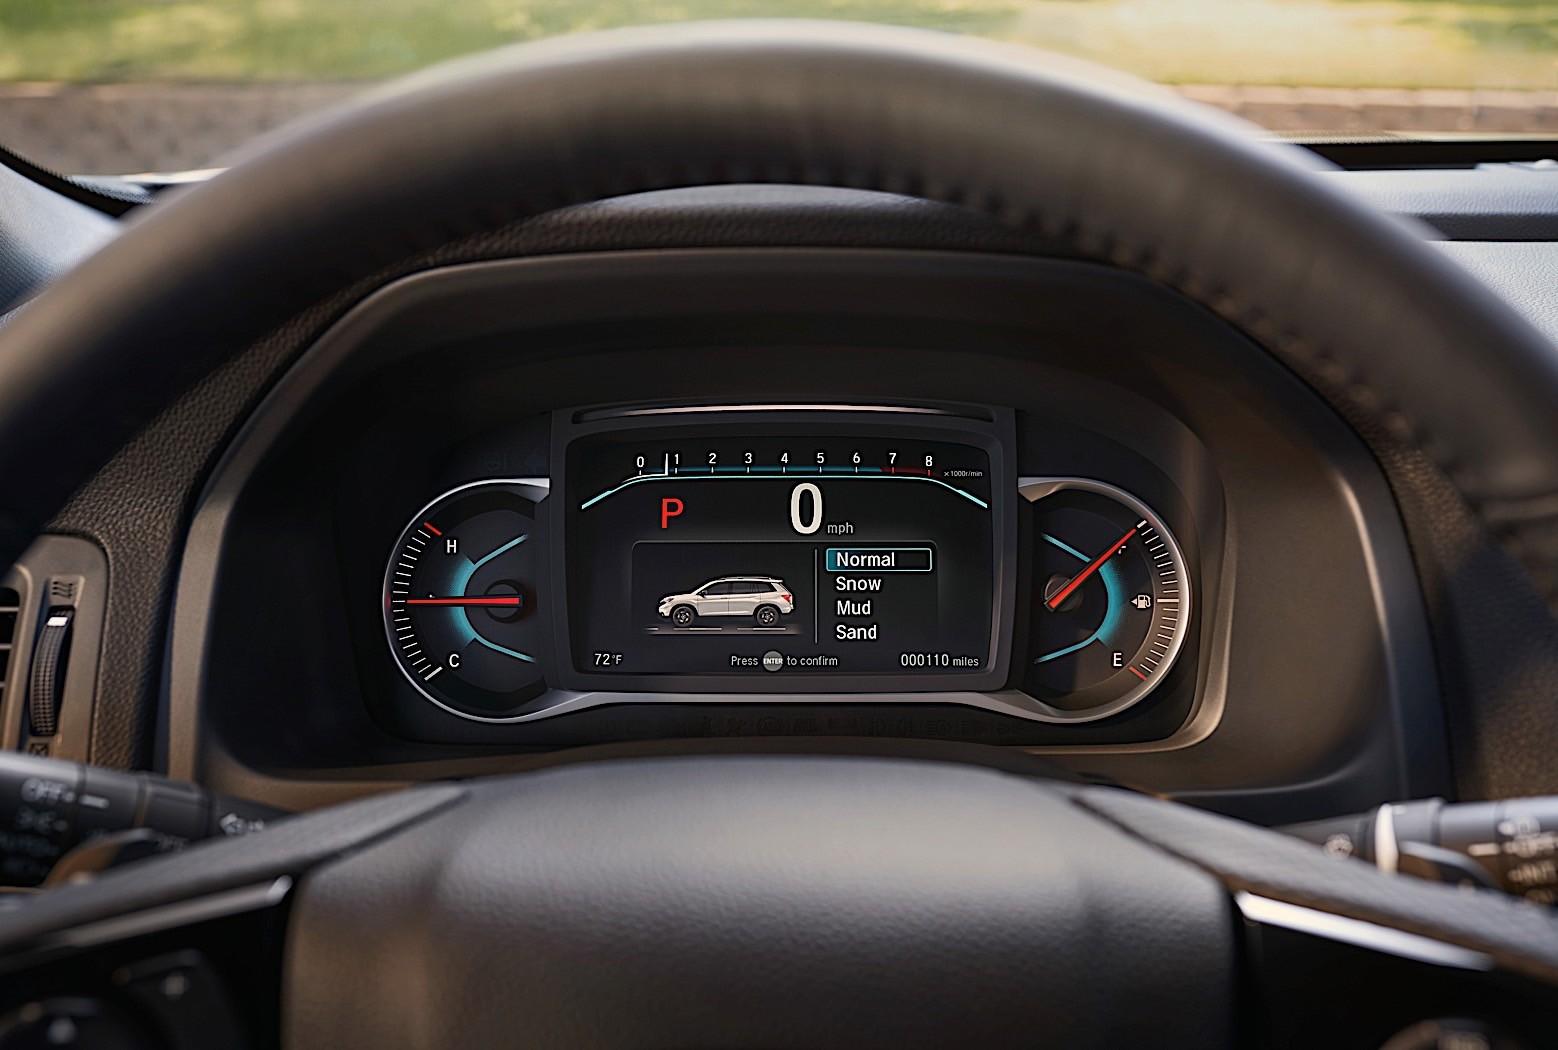 Honda Pilot Towing Capacity >> Honda Alabama Starts Production Of 2019 Passport - autoevolution